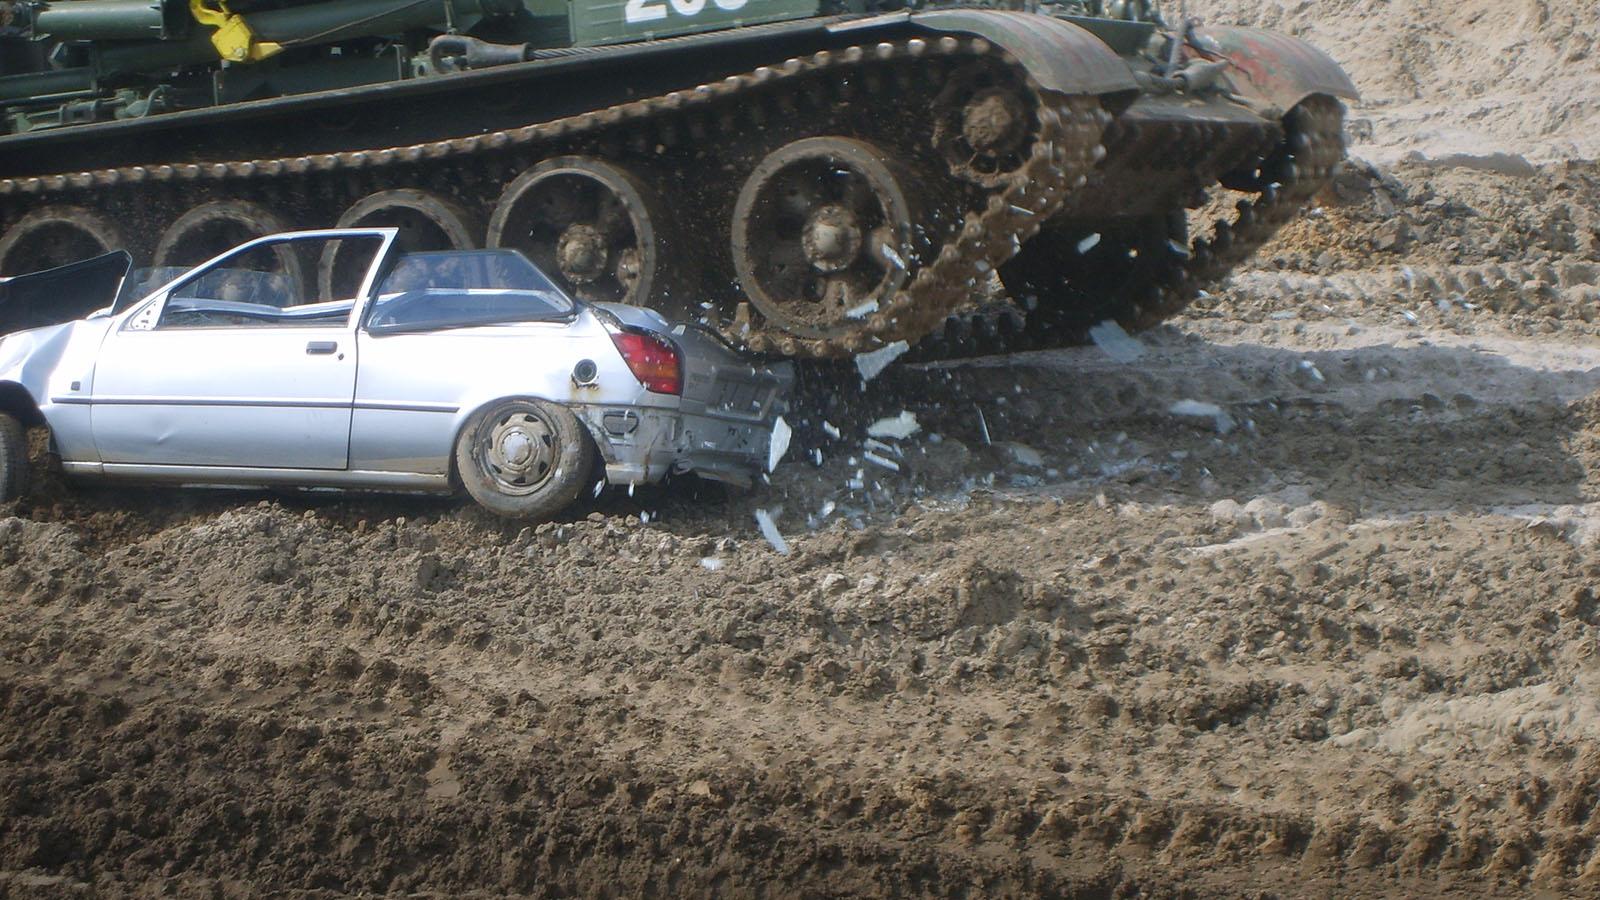 Panzer Selber Fahren Bei Berlin Erlebnisfabrik